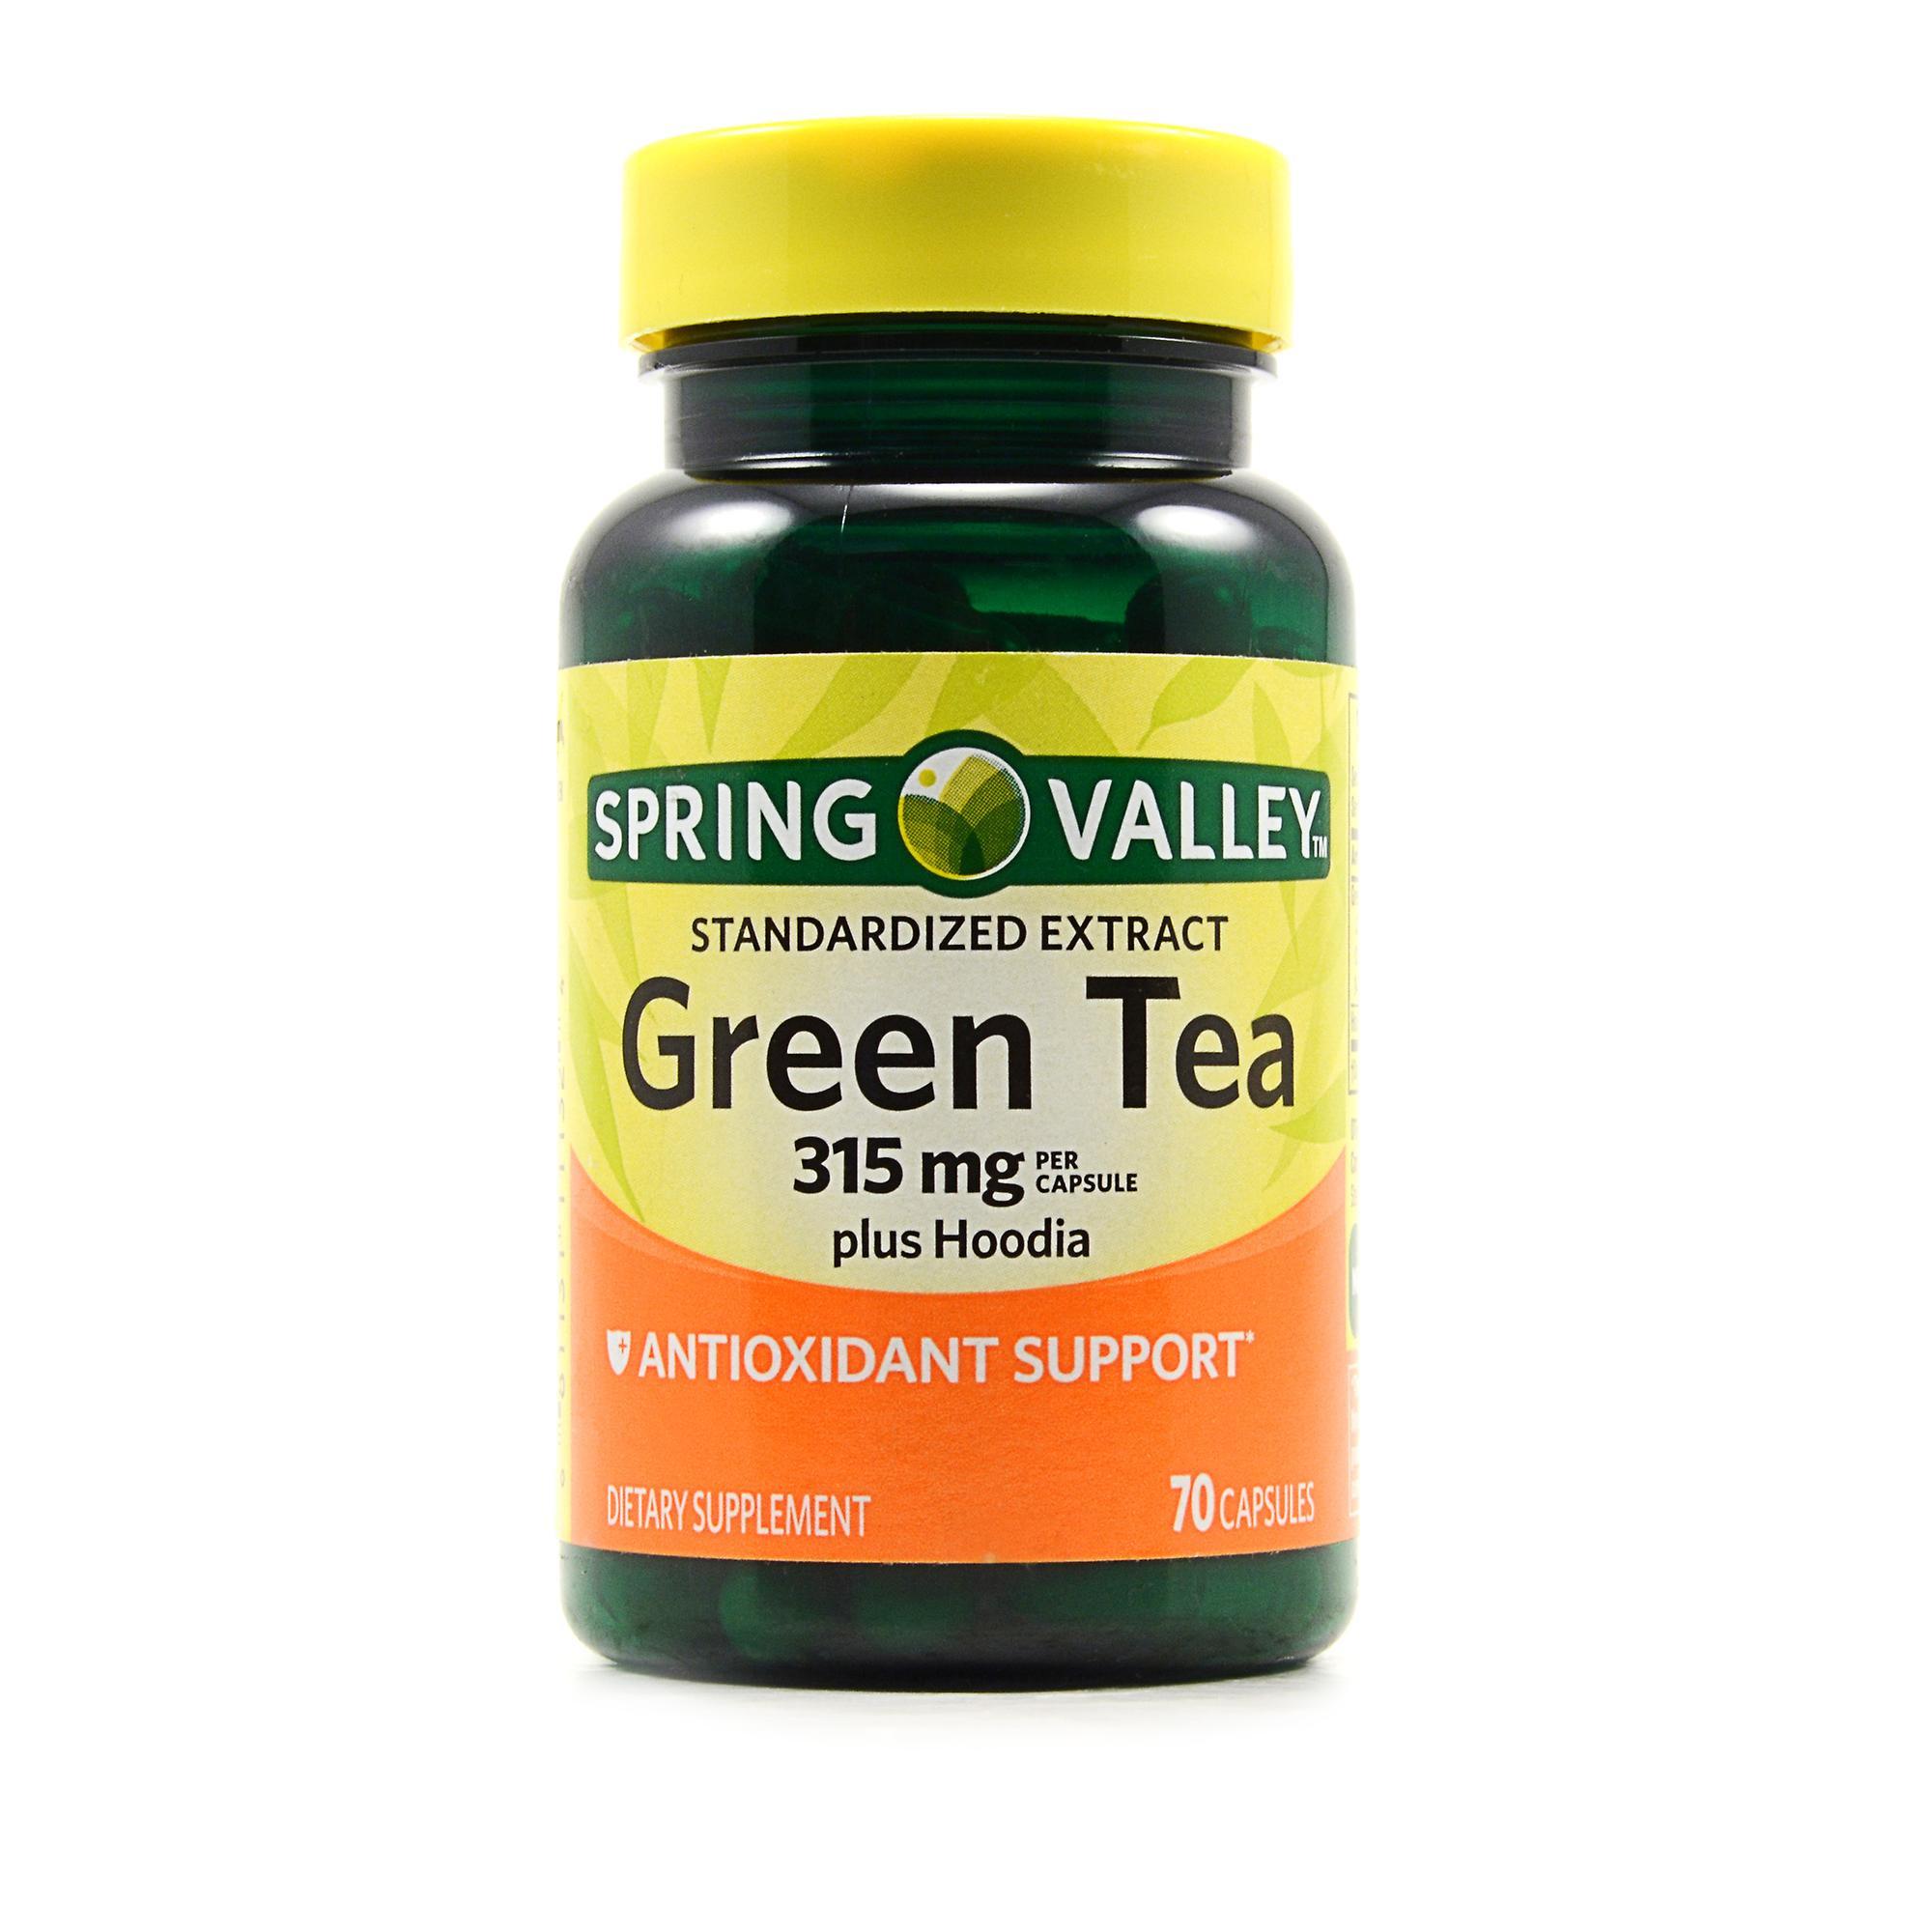 Spring Valley Organic Greens  Spring Valley Green Tea Review LabDoor